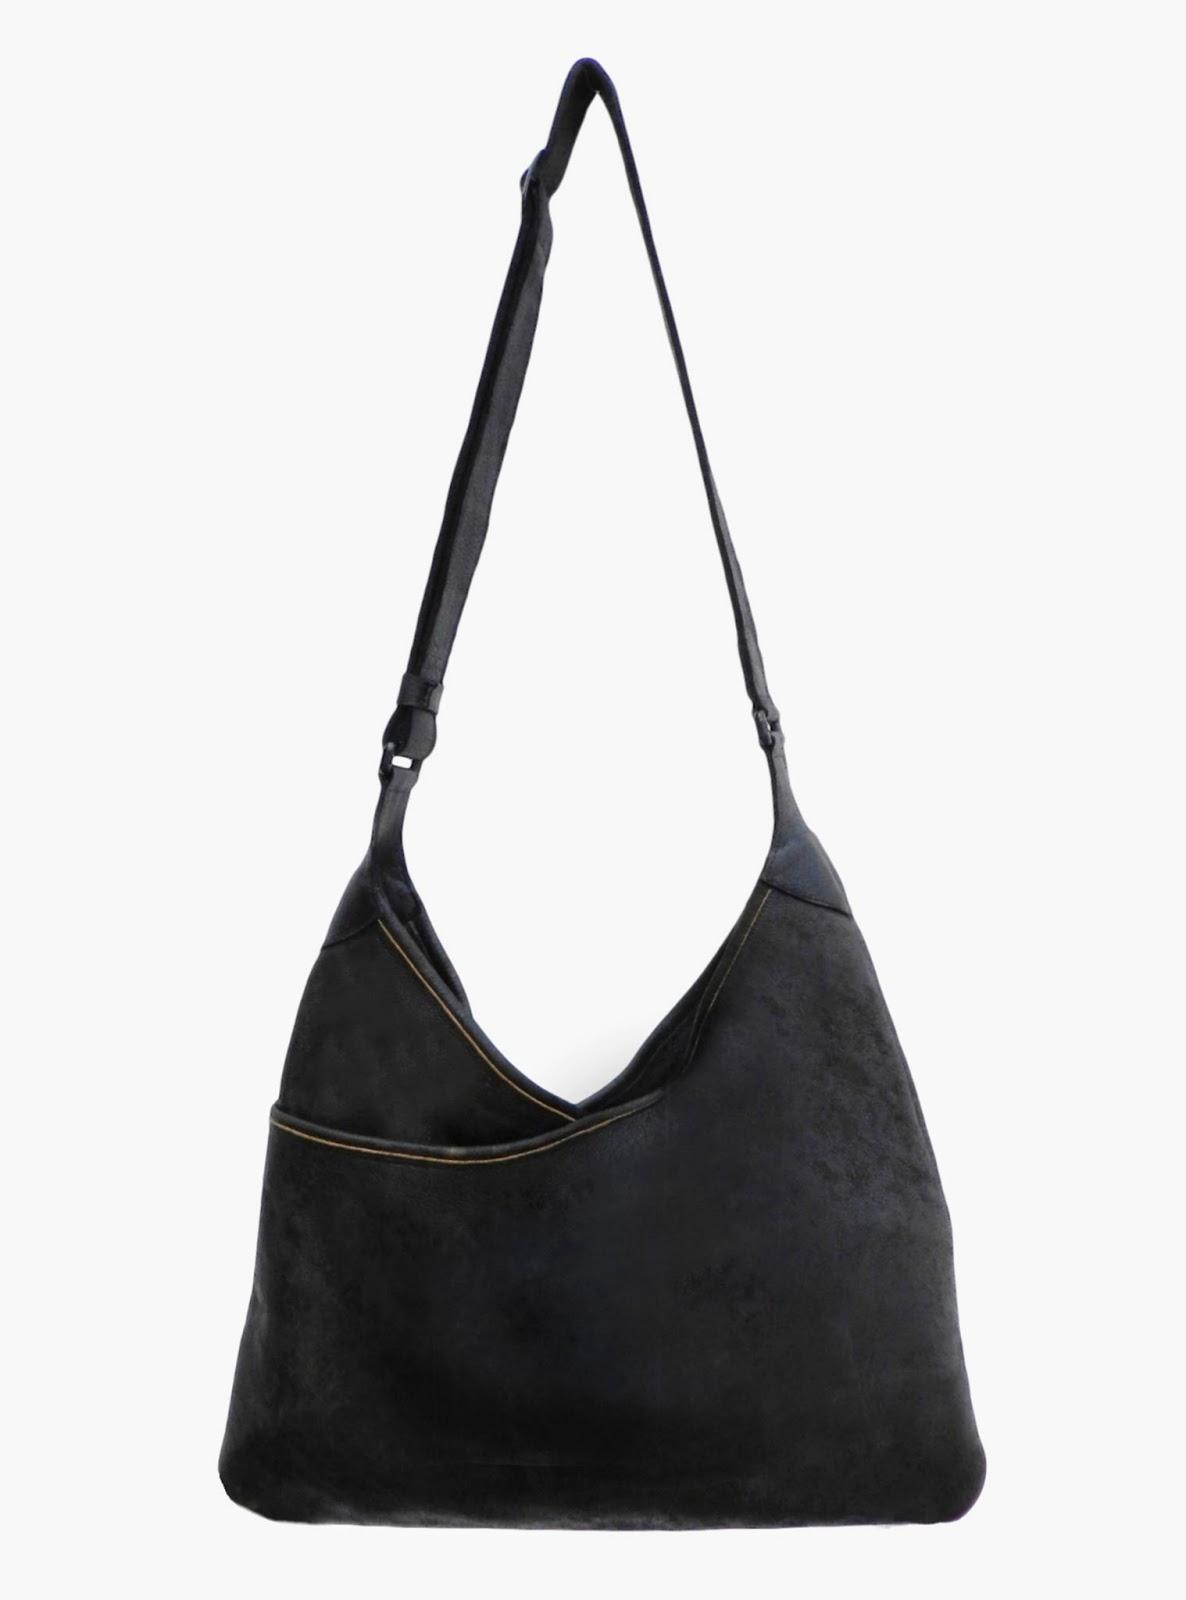 Lily and Lola 'Lisa' Burnt Black Leather